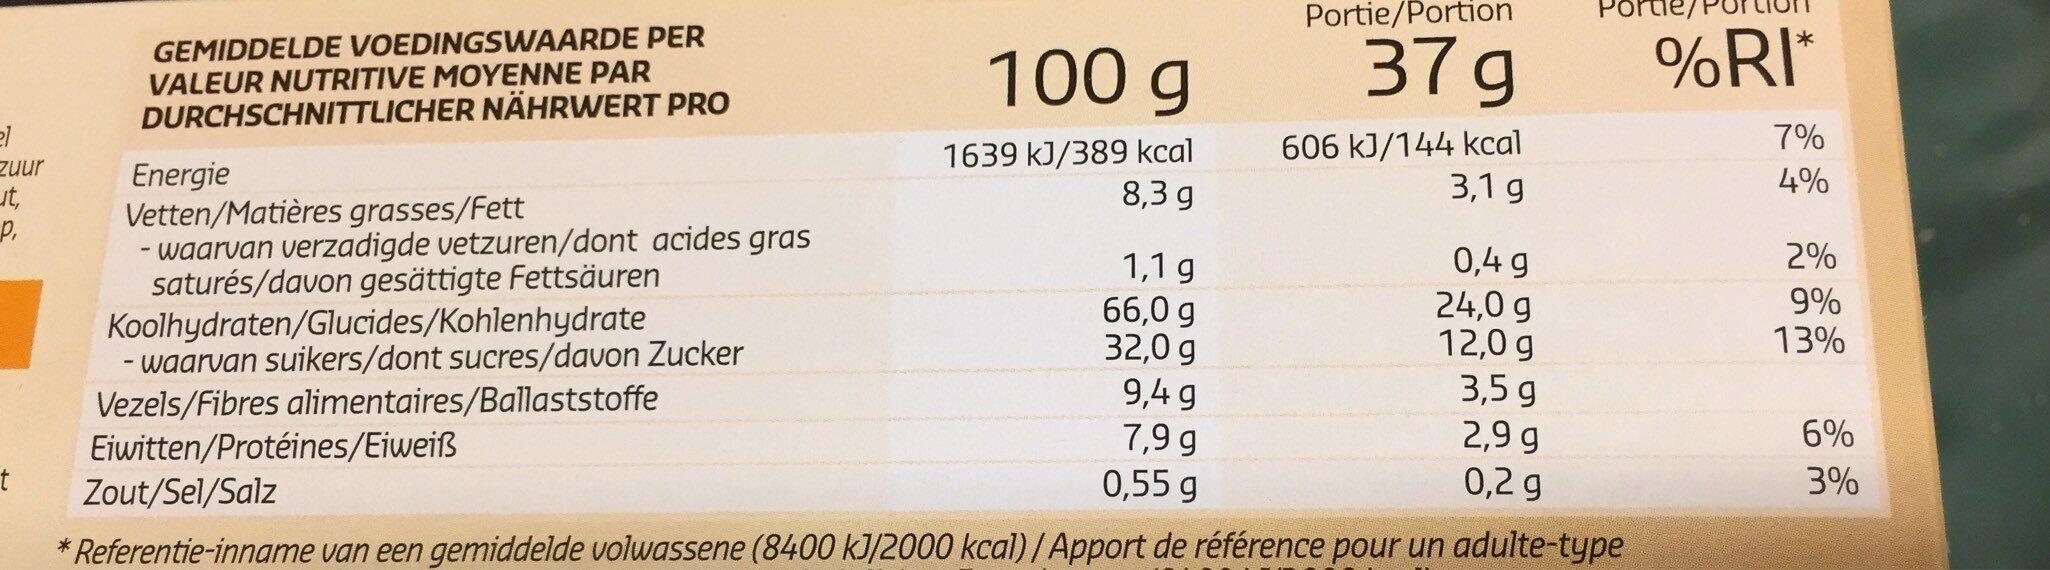 Biscuits multicéréales pomme - Voedingswaarden - fr